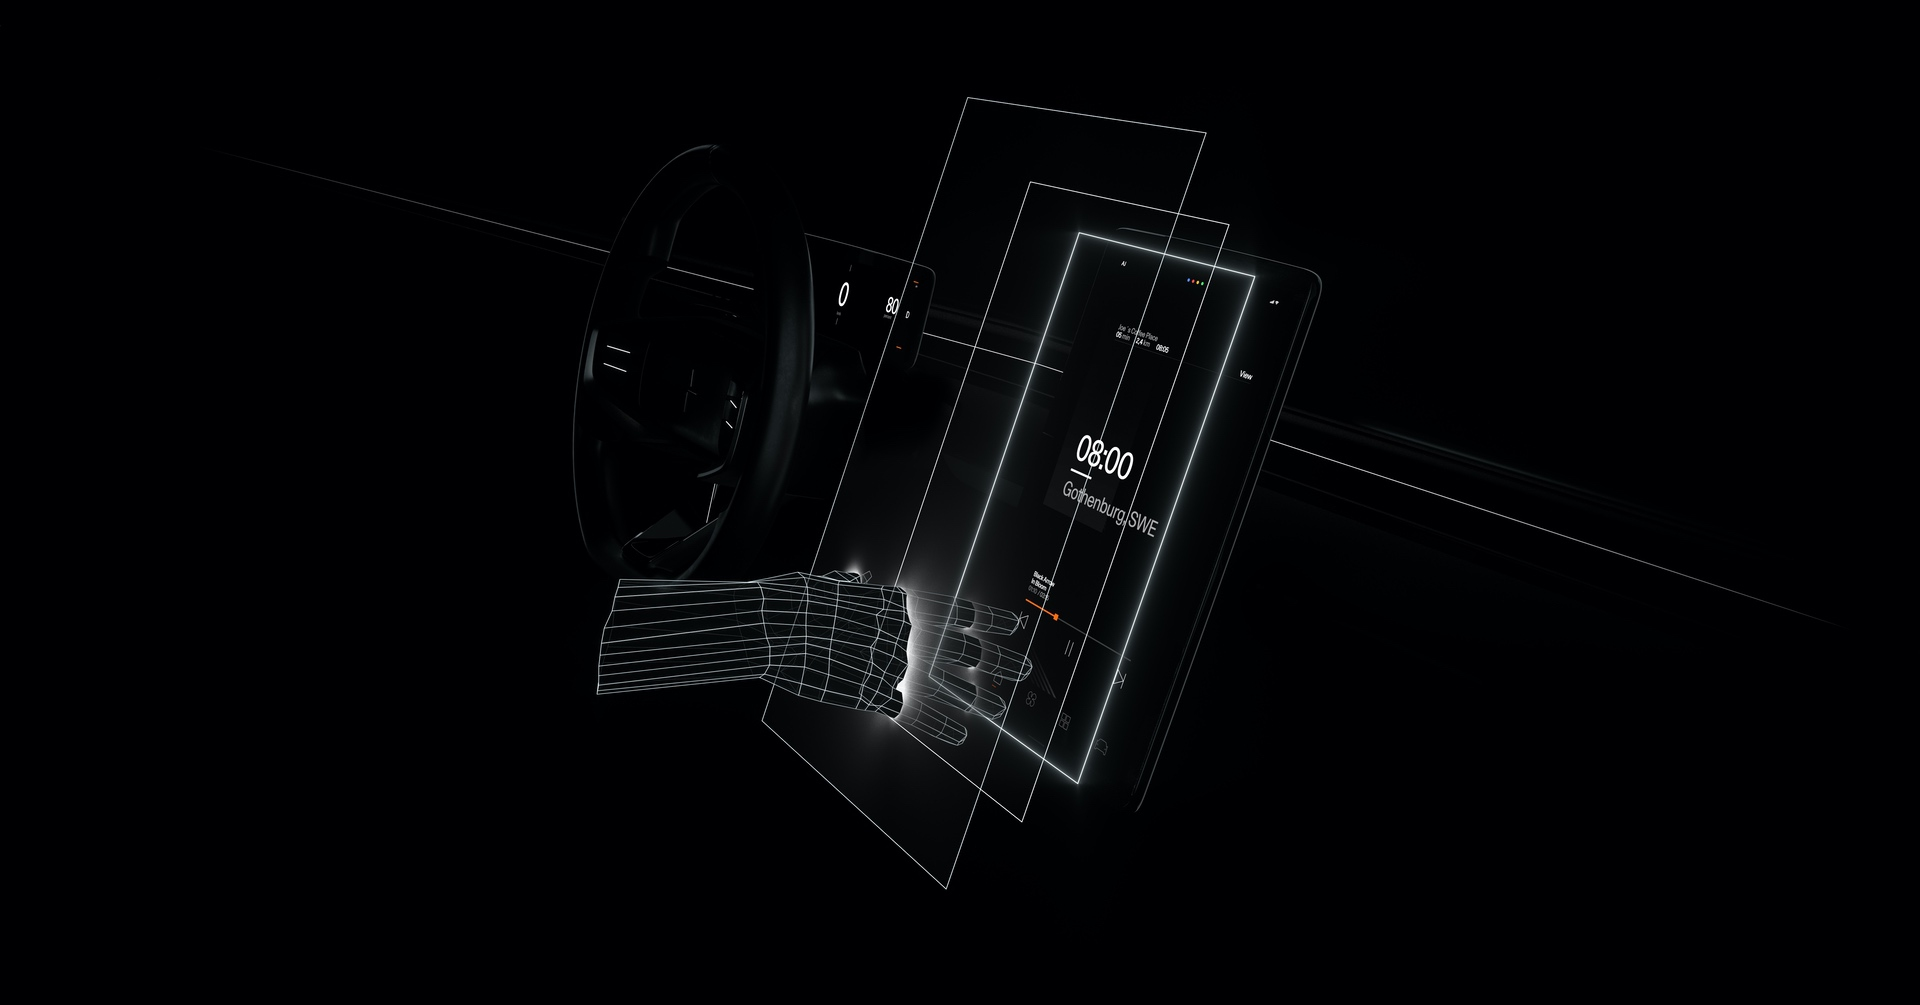 Polestar_future_HMI_proximity_sensors_004